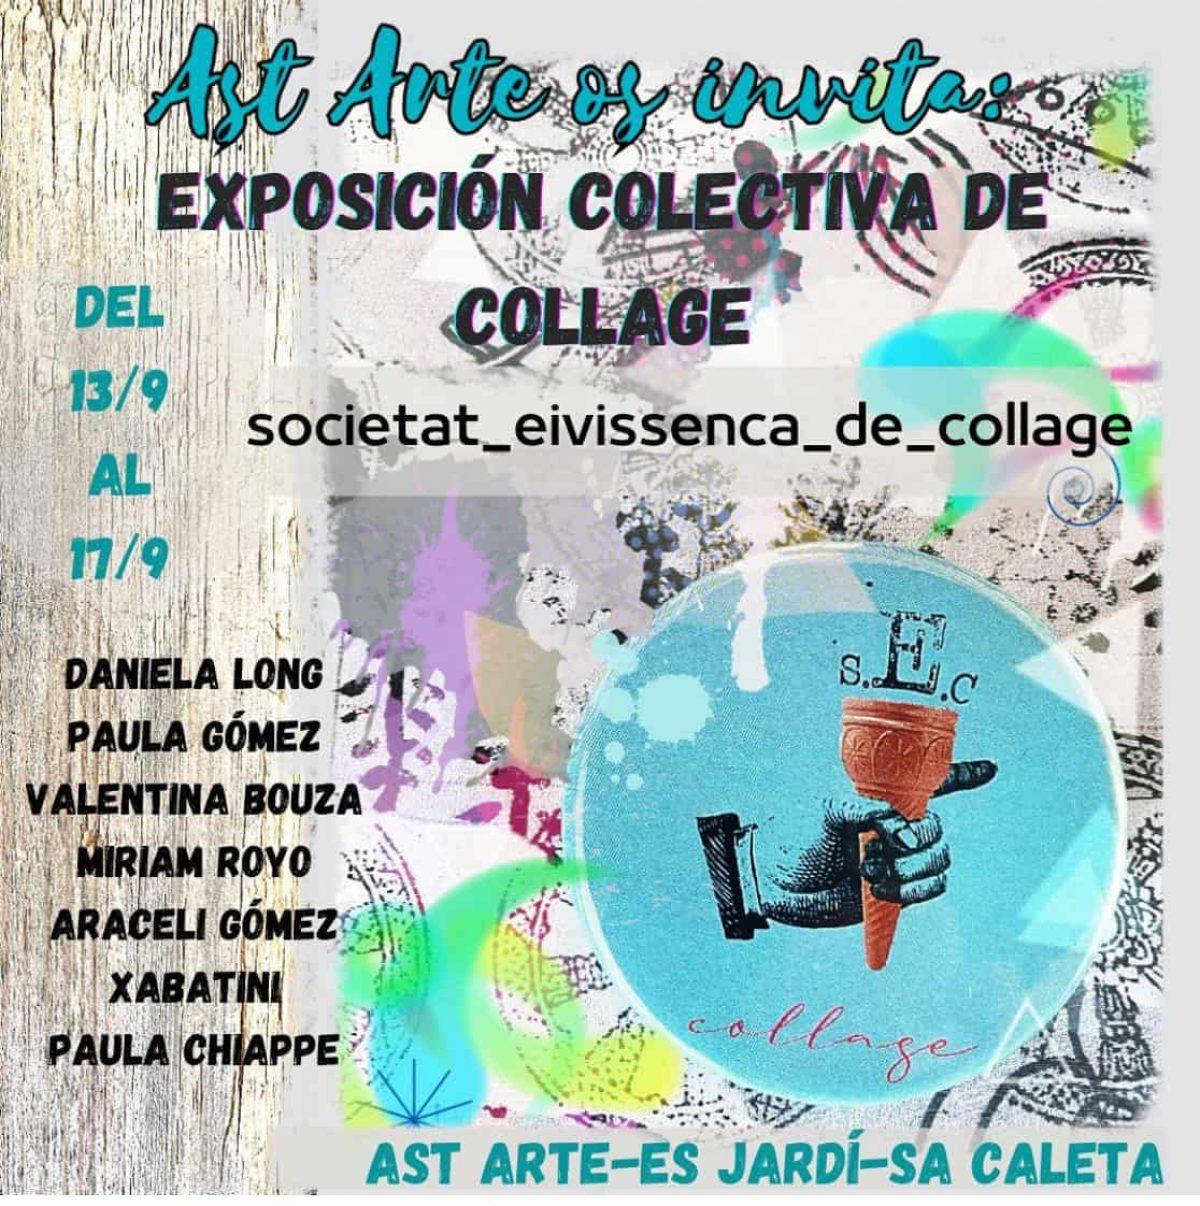 exposicio-col·lectiva-collage-Astarte-Eivissa-2021-welcometoibiza